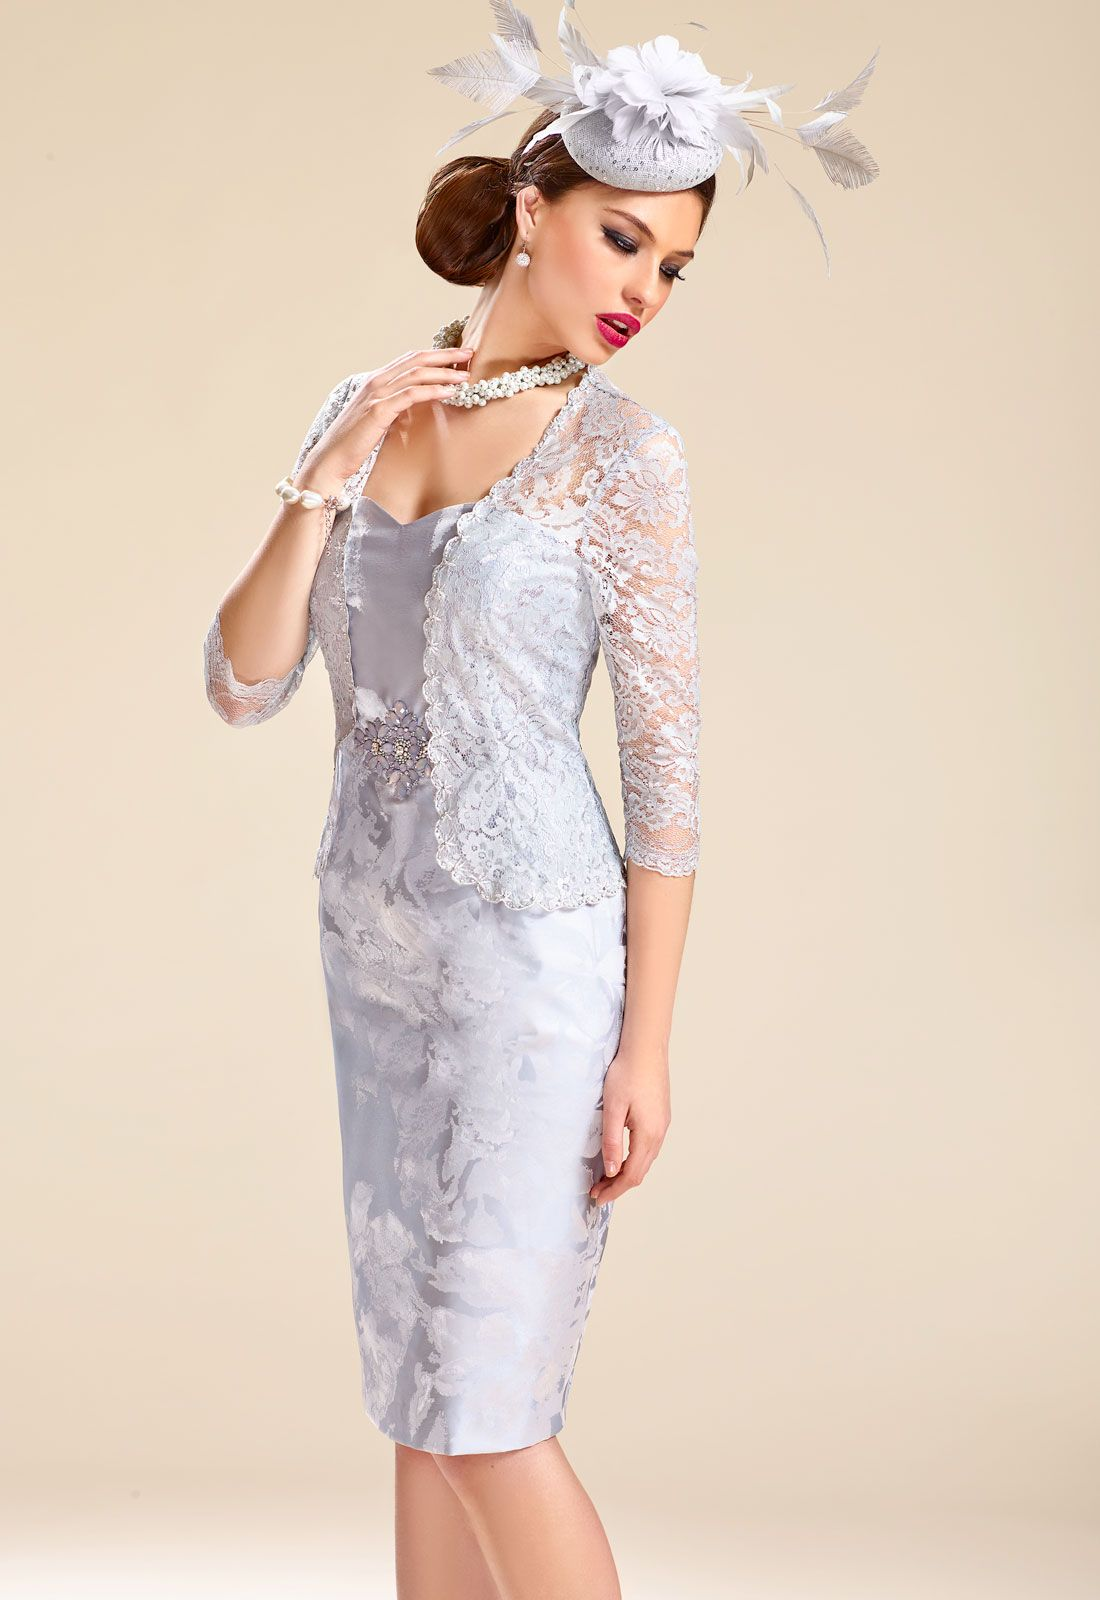 Group Design Vestido Zelia De Gn 9146 Donna 6nwqOFxIUW